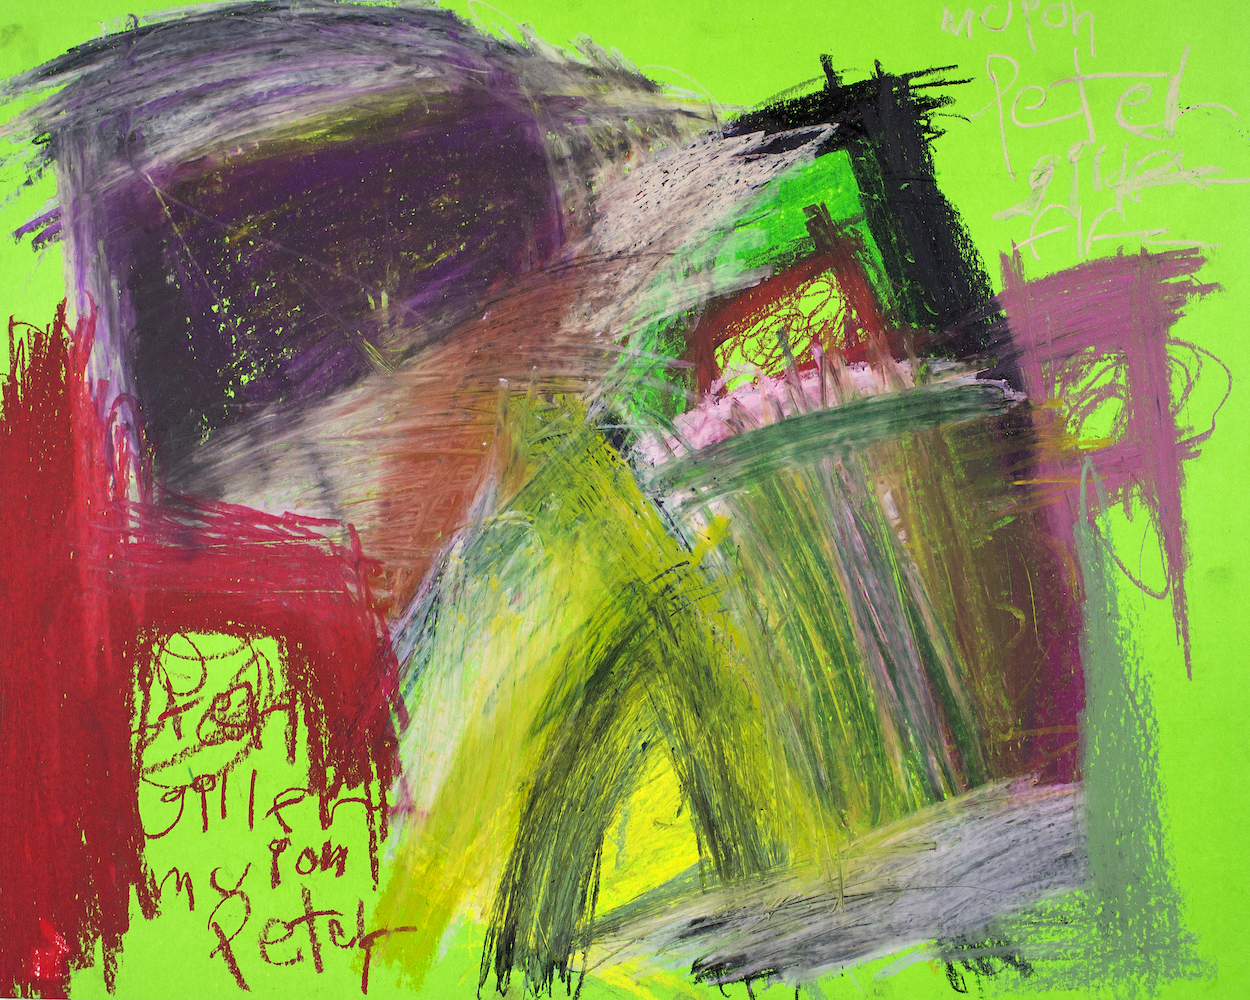 Peter Dudding - Portait of Gillean on Green.jpg